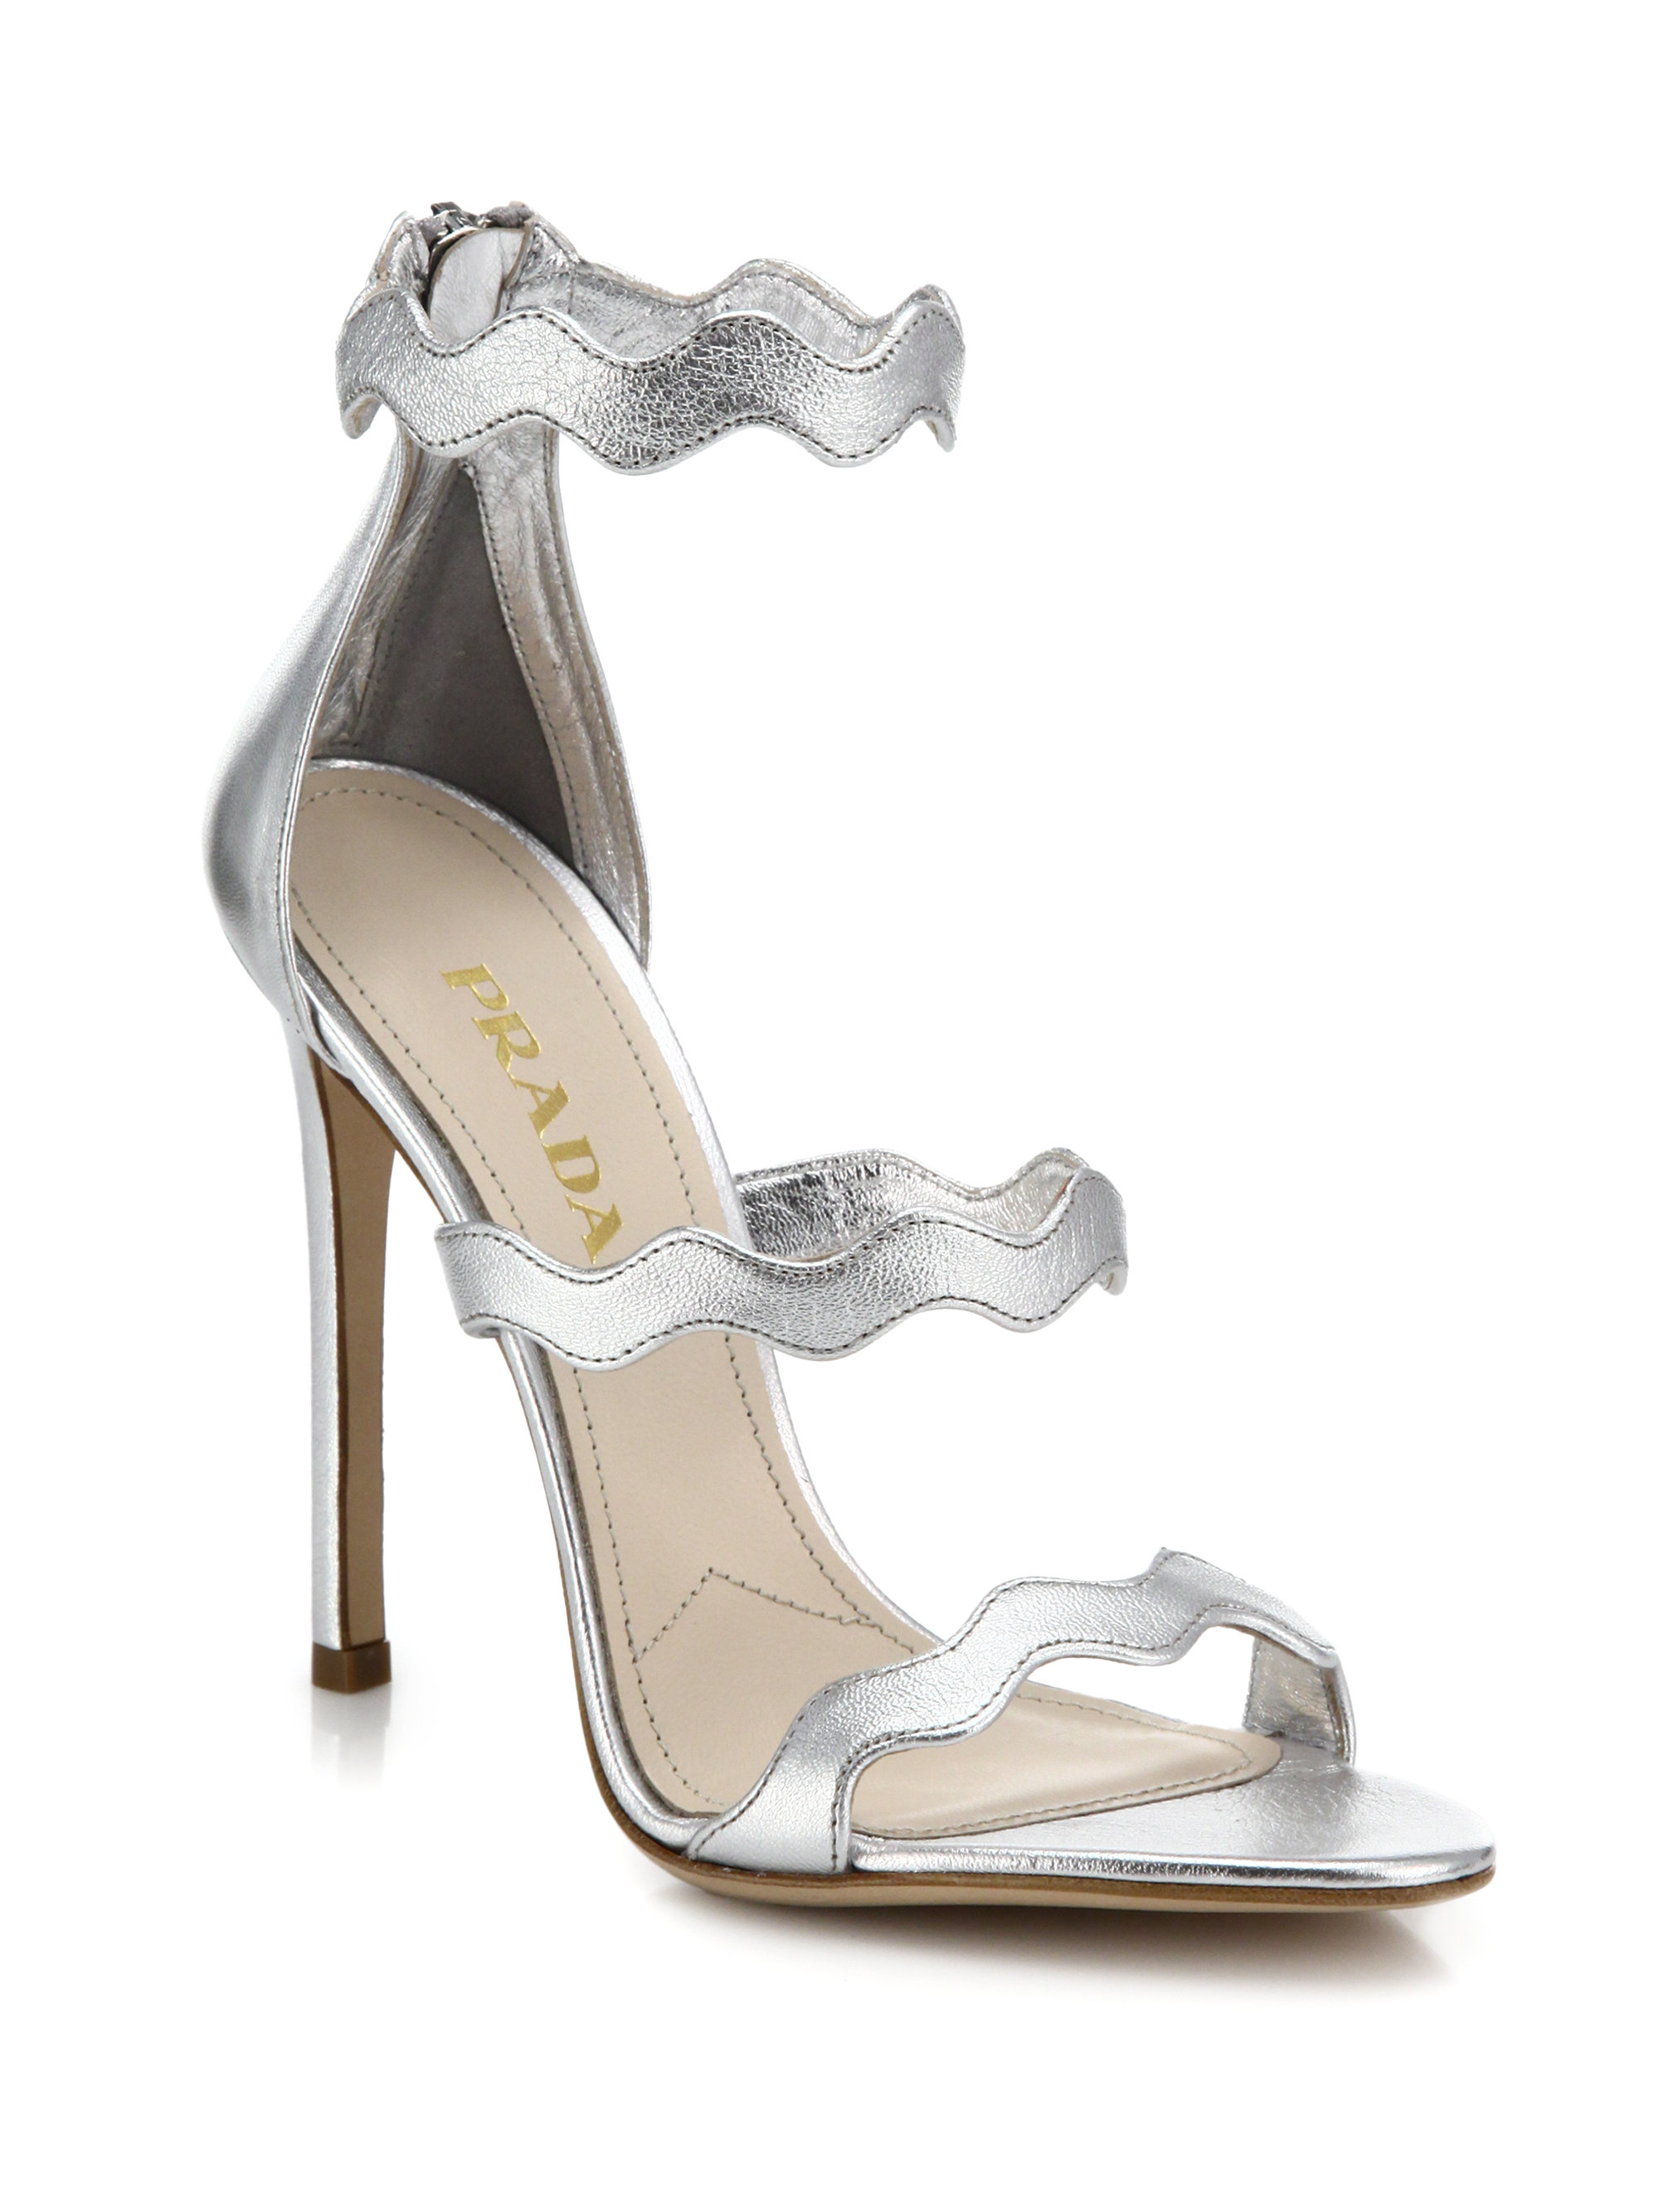 a9b56b62022fc Prada Scalloped Metallic Leather Sandals in Metallic - Lyst